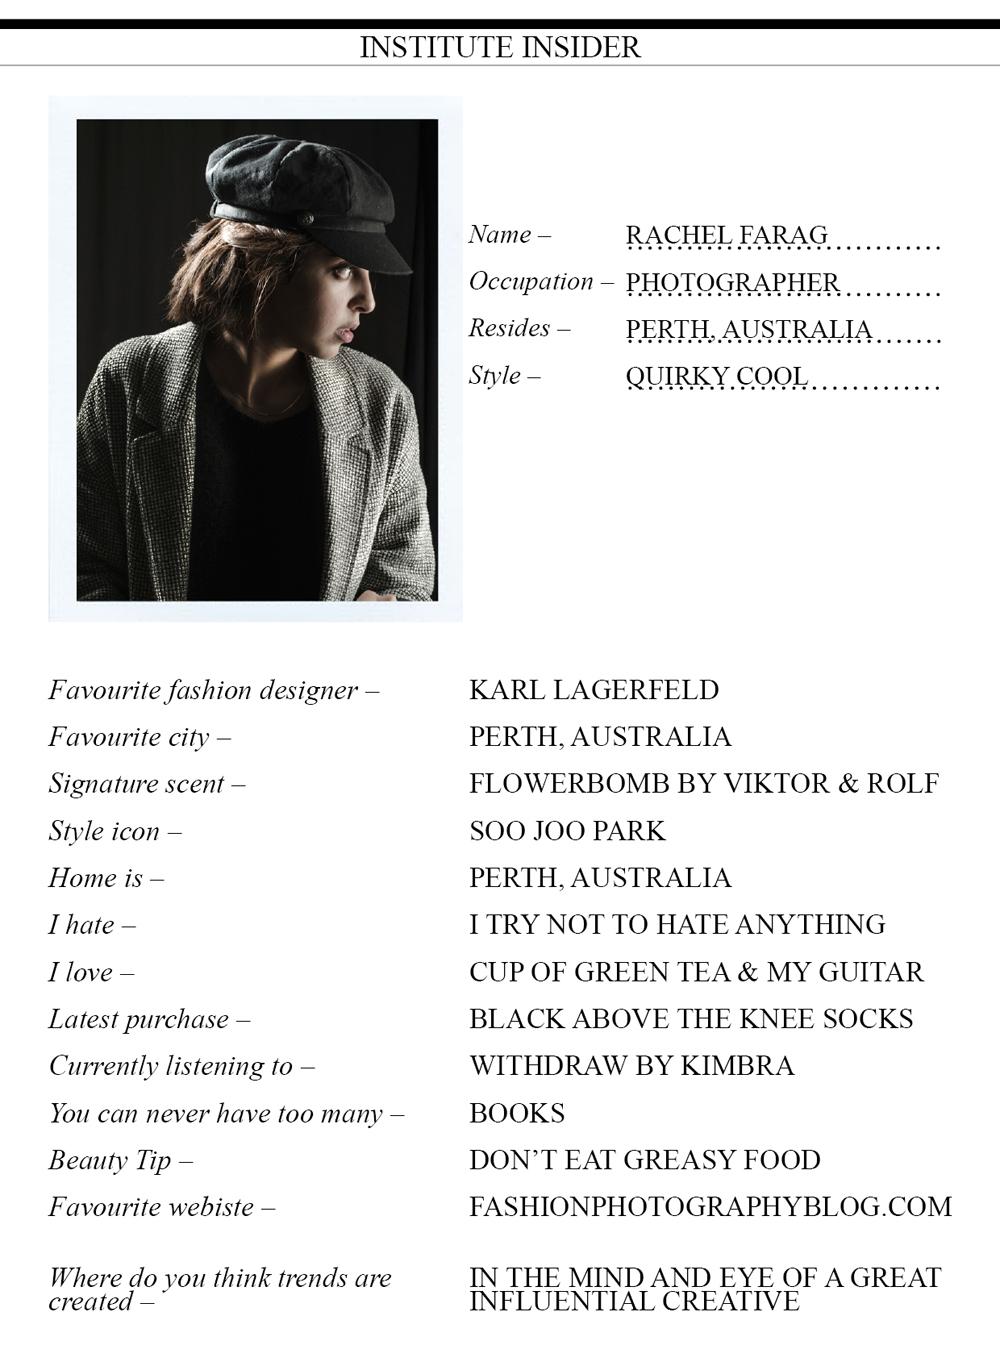 Rachel Farag Profile 2